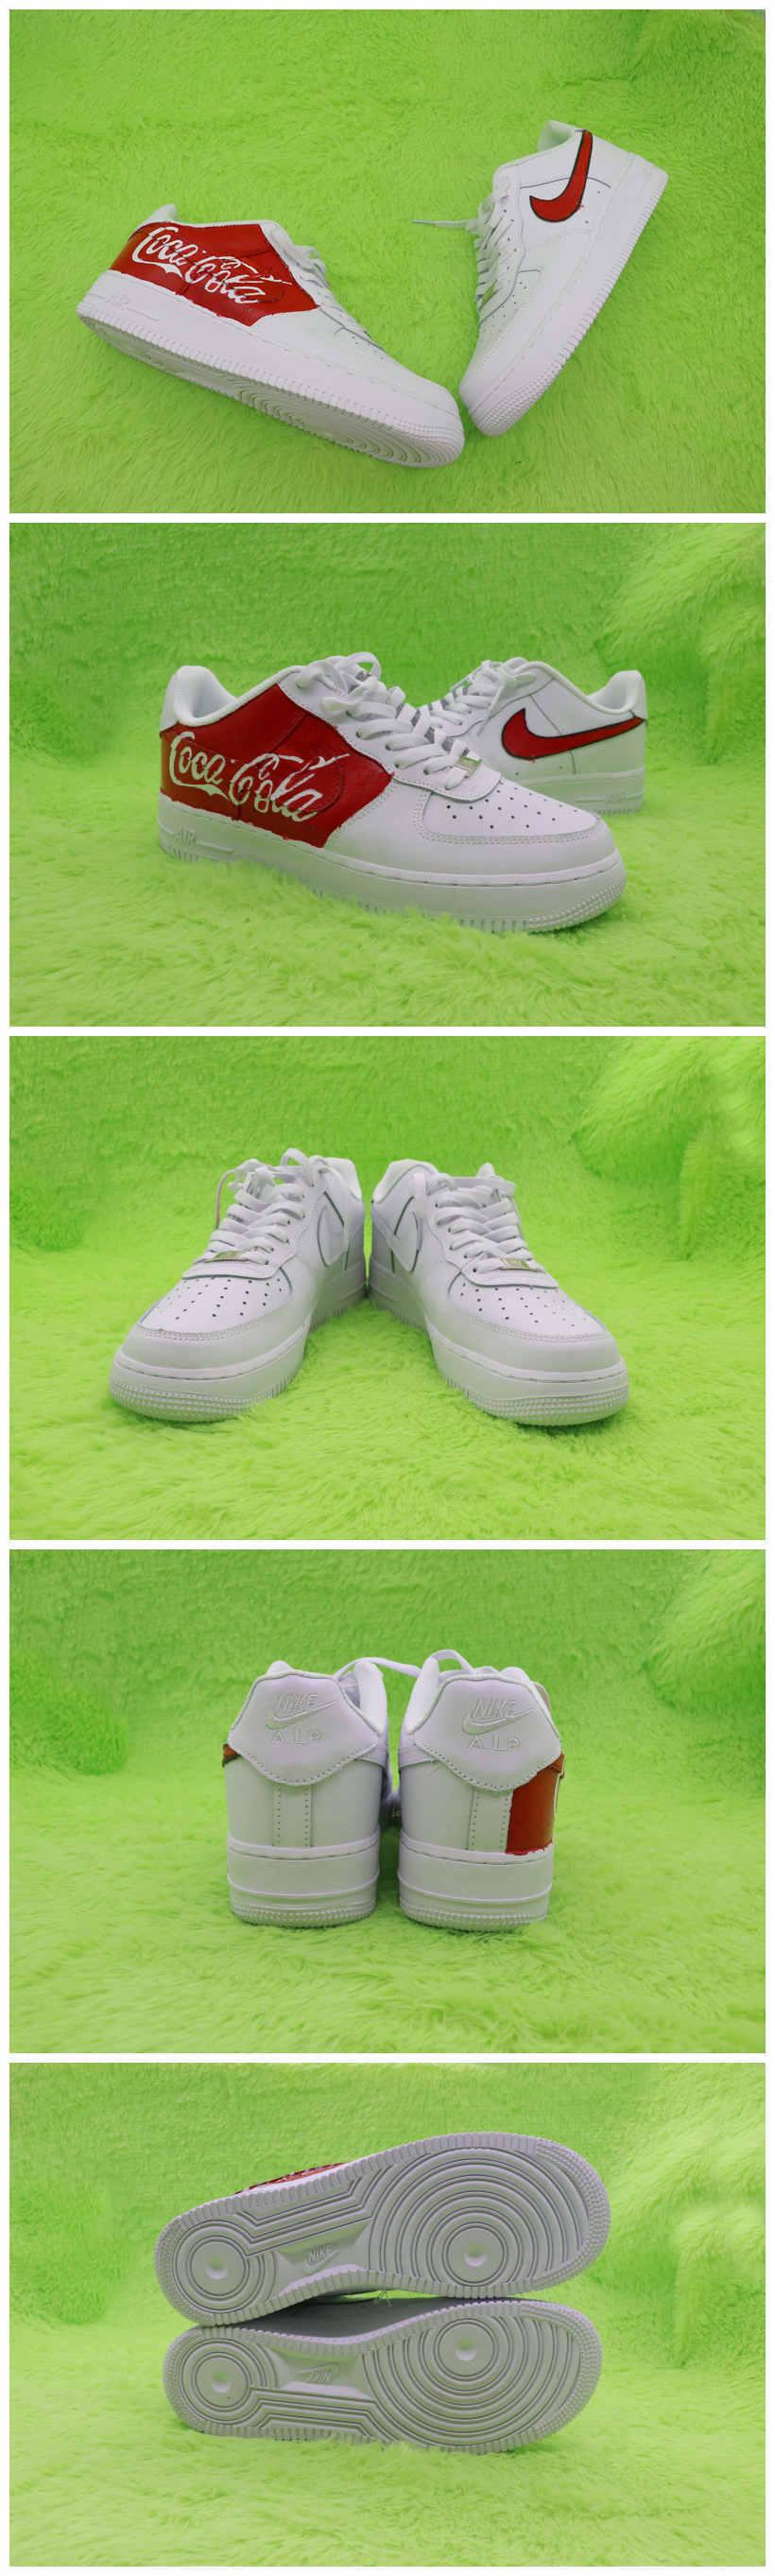 Custom Coca-Cola Shoes For Air Force 1 White Graffiti Hand Painted Sneaker - A003Custom Coca-Cola Shoes For Air Force 1 White Graffiti Hand Painted Sneaker - The Zero Custom